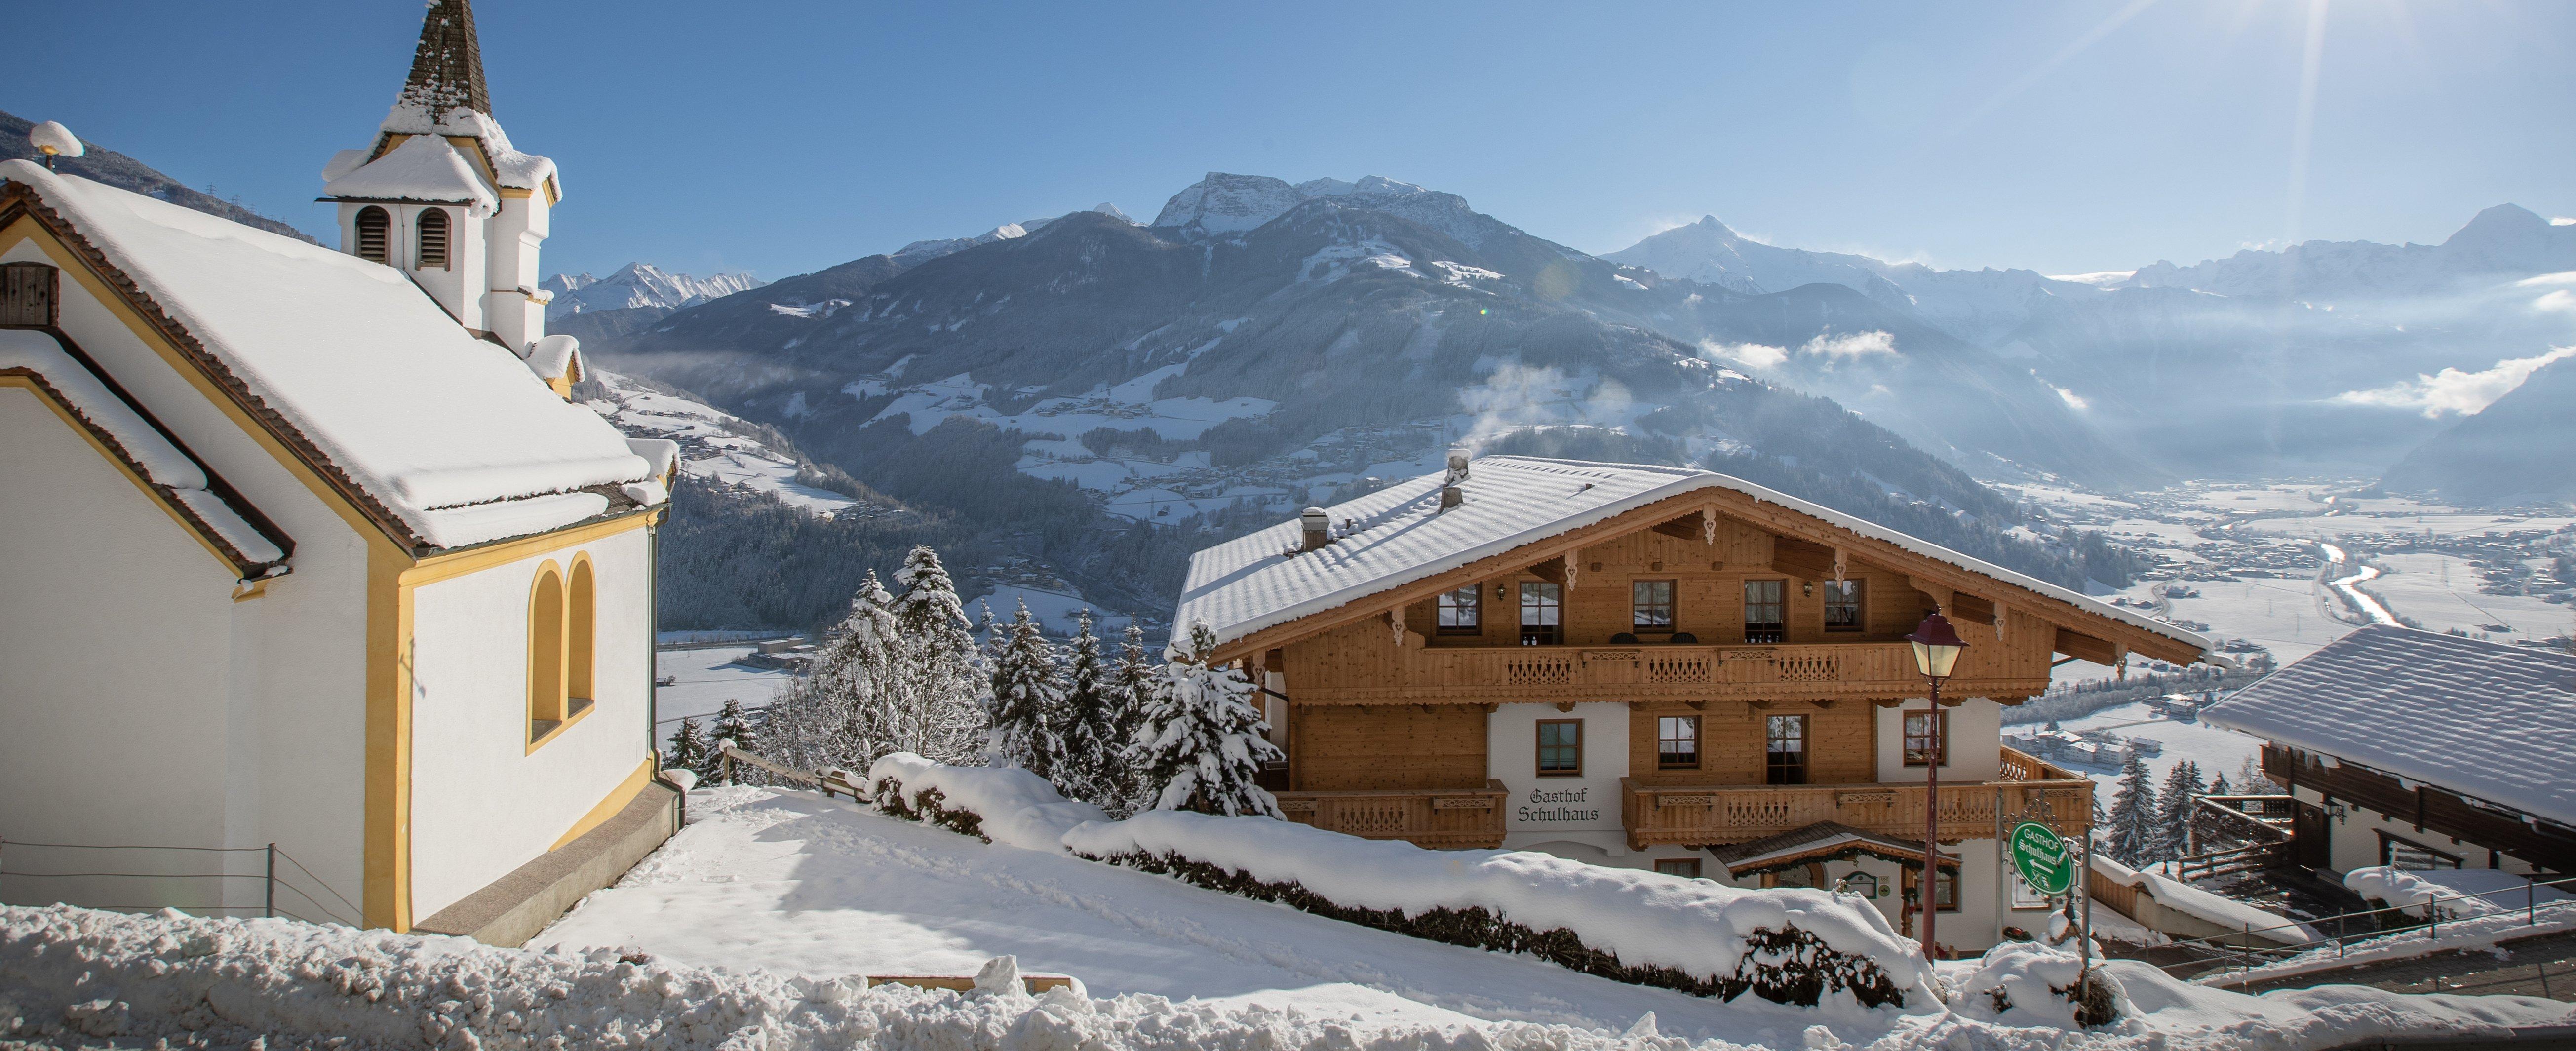 Austrian Alps, Austria Food Guide: 10 Austrian food Must-Eat Restaurants & Street Food Stalls in Aschau im Zillertal